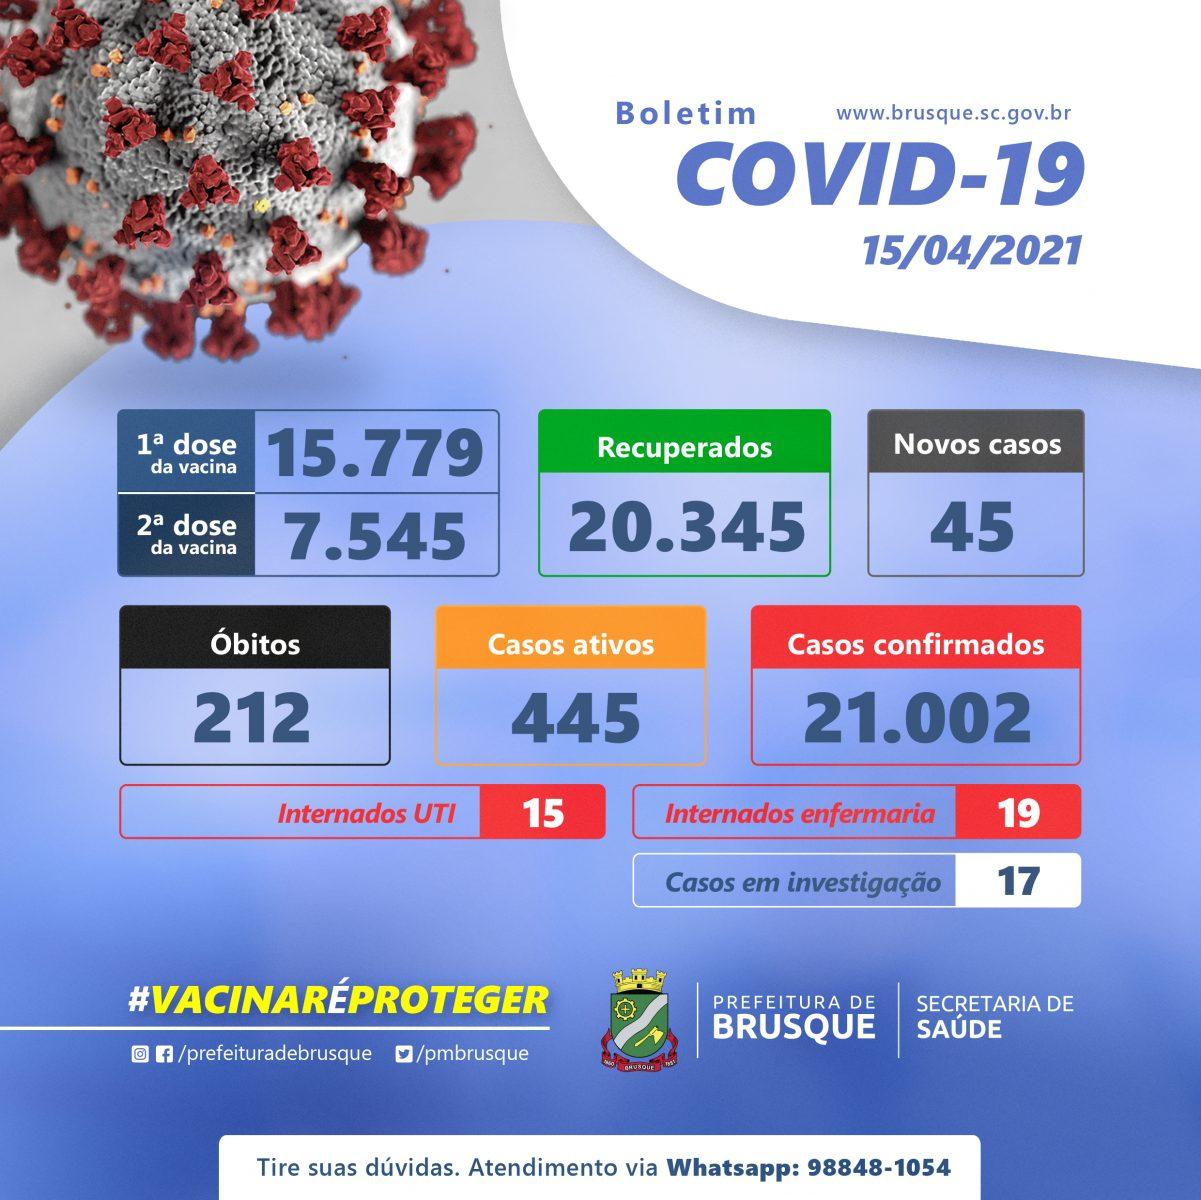 Covid 19: Confira o boletim epidemiológico desta quinta-feira (15)